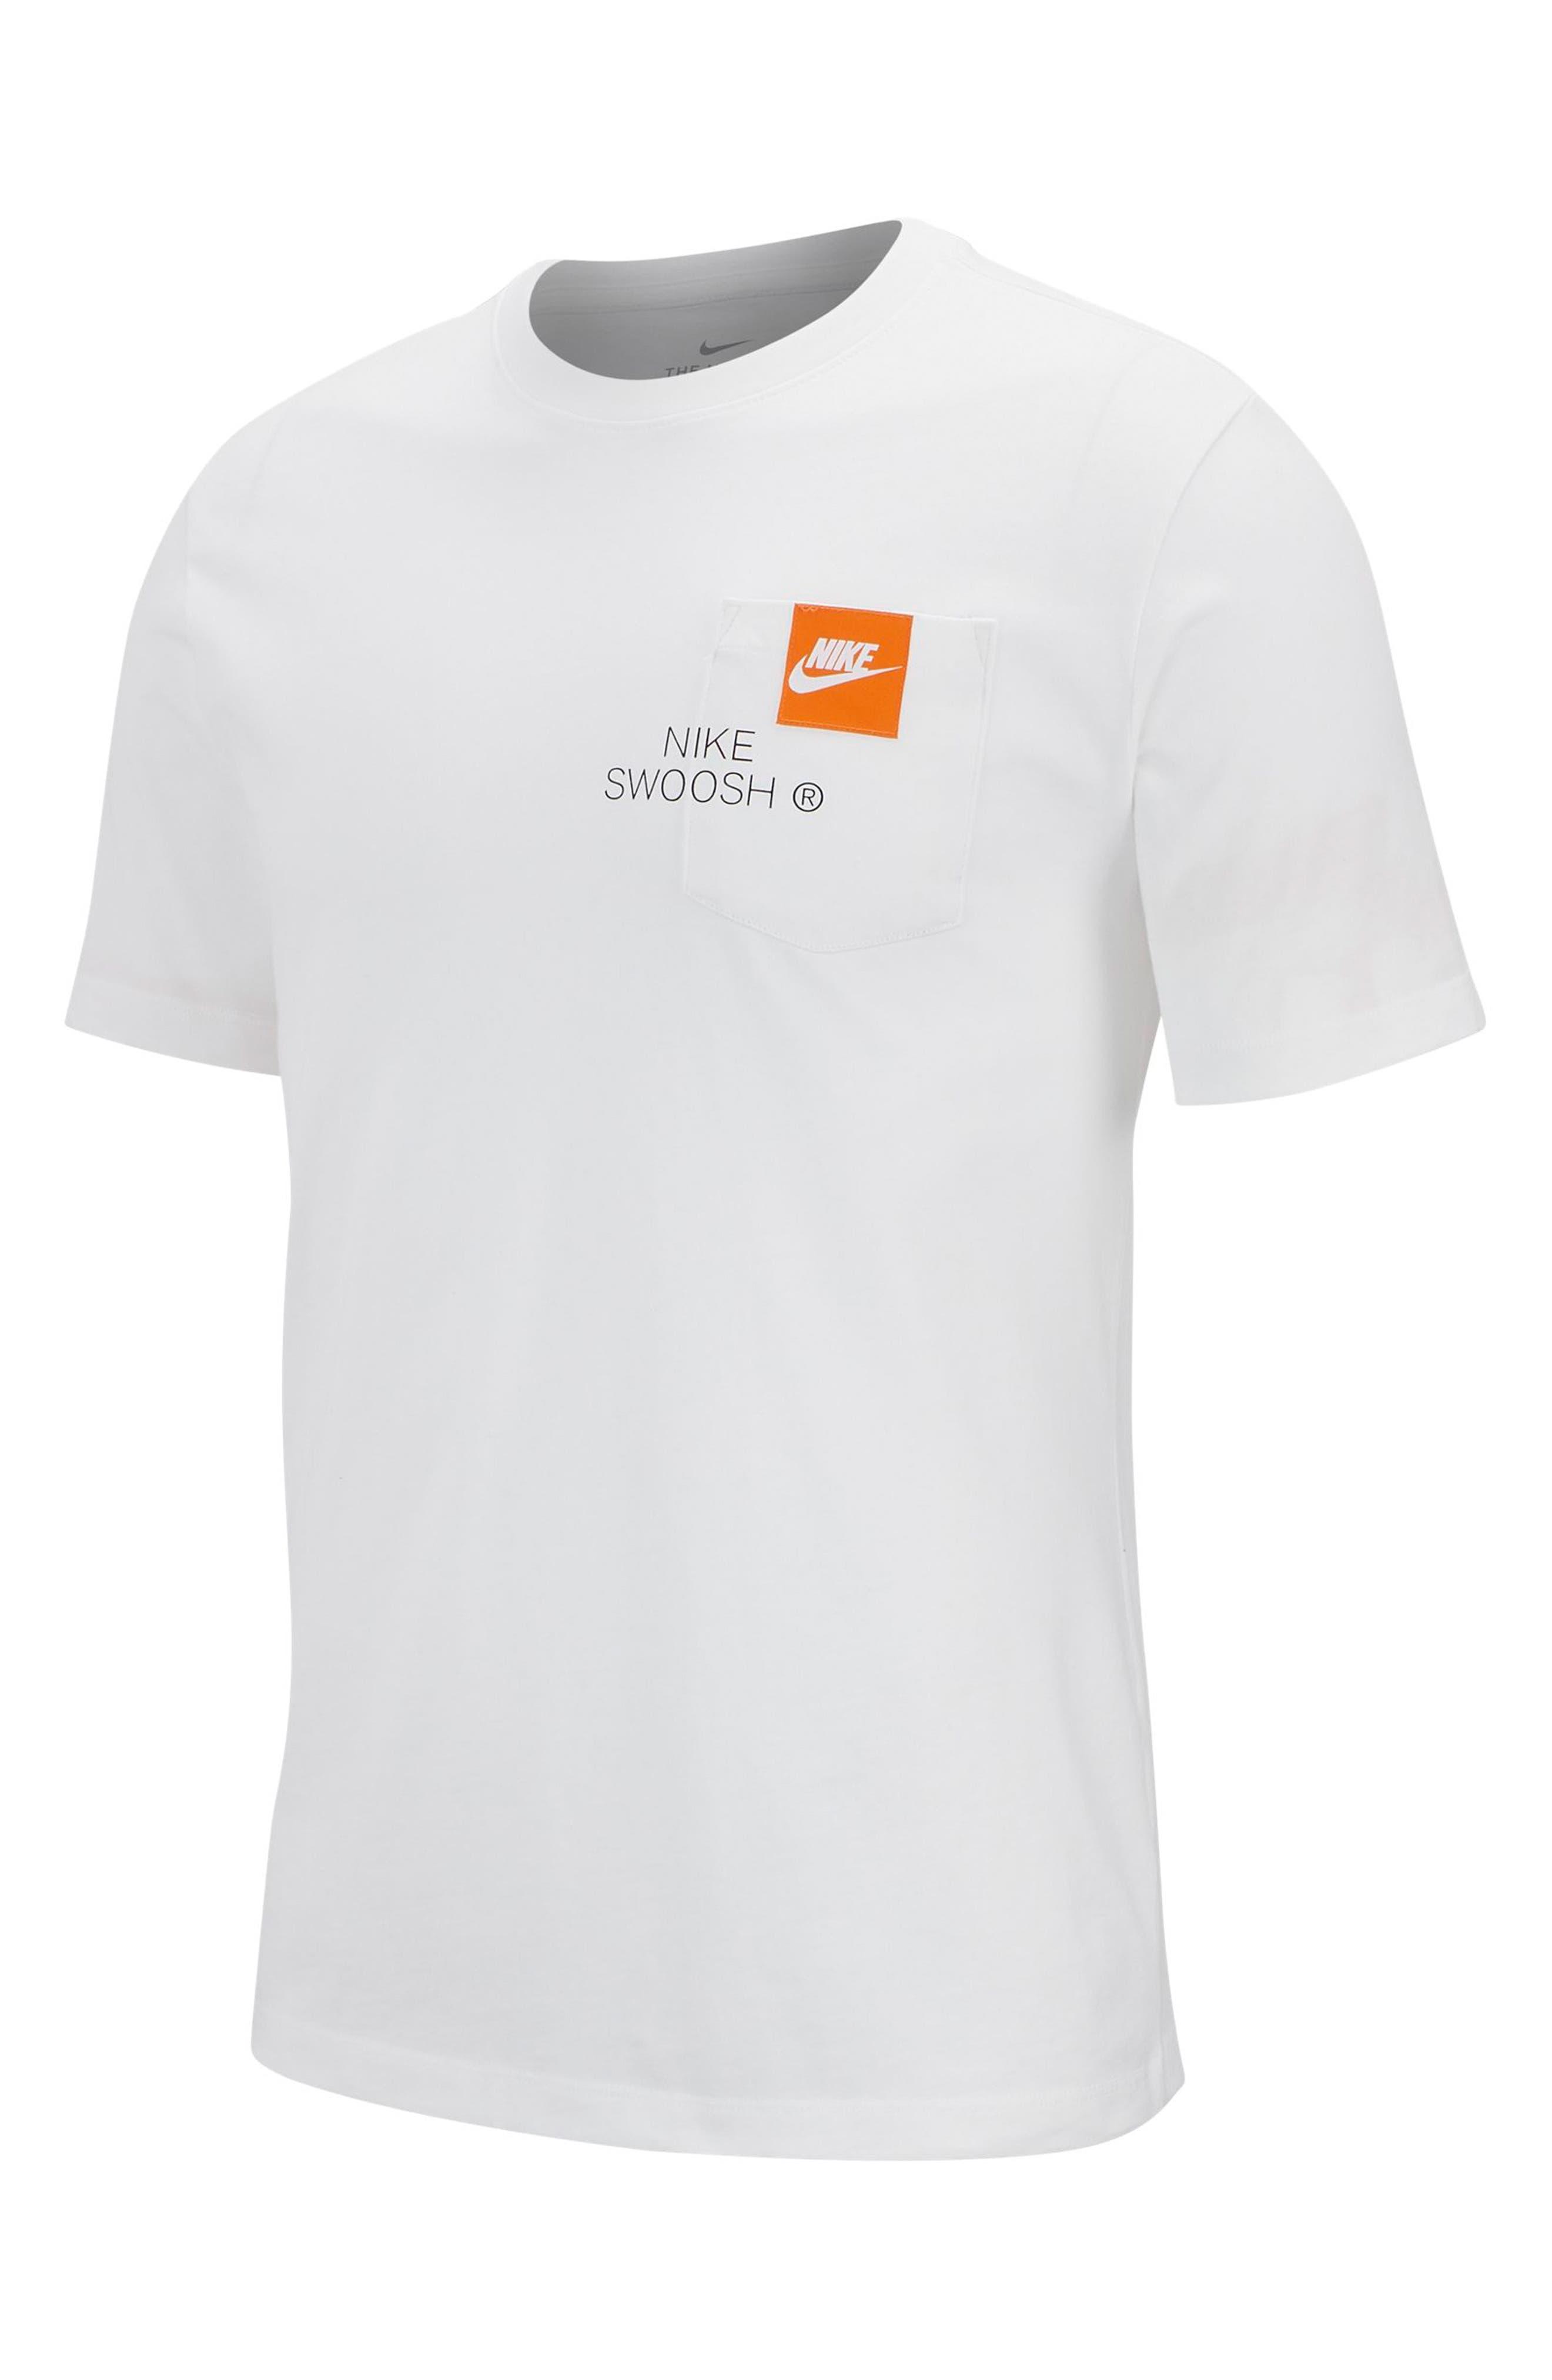 Sportswear Men's T-Shirt,                             Main thumbnail 1, color,                             WHITE